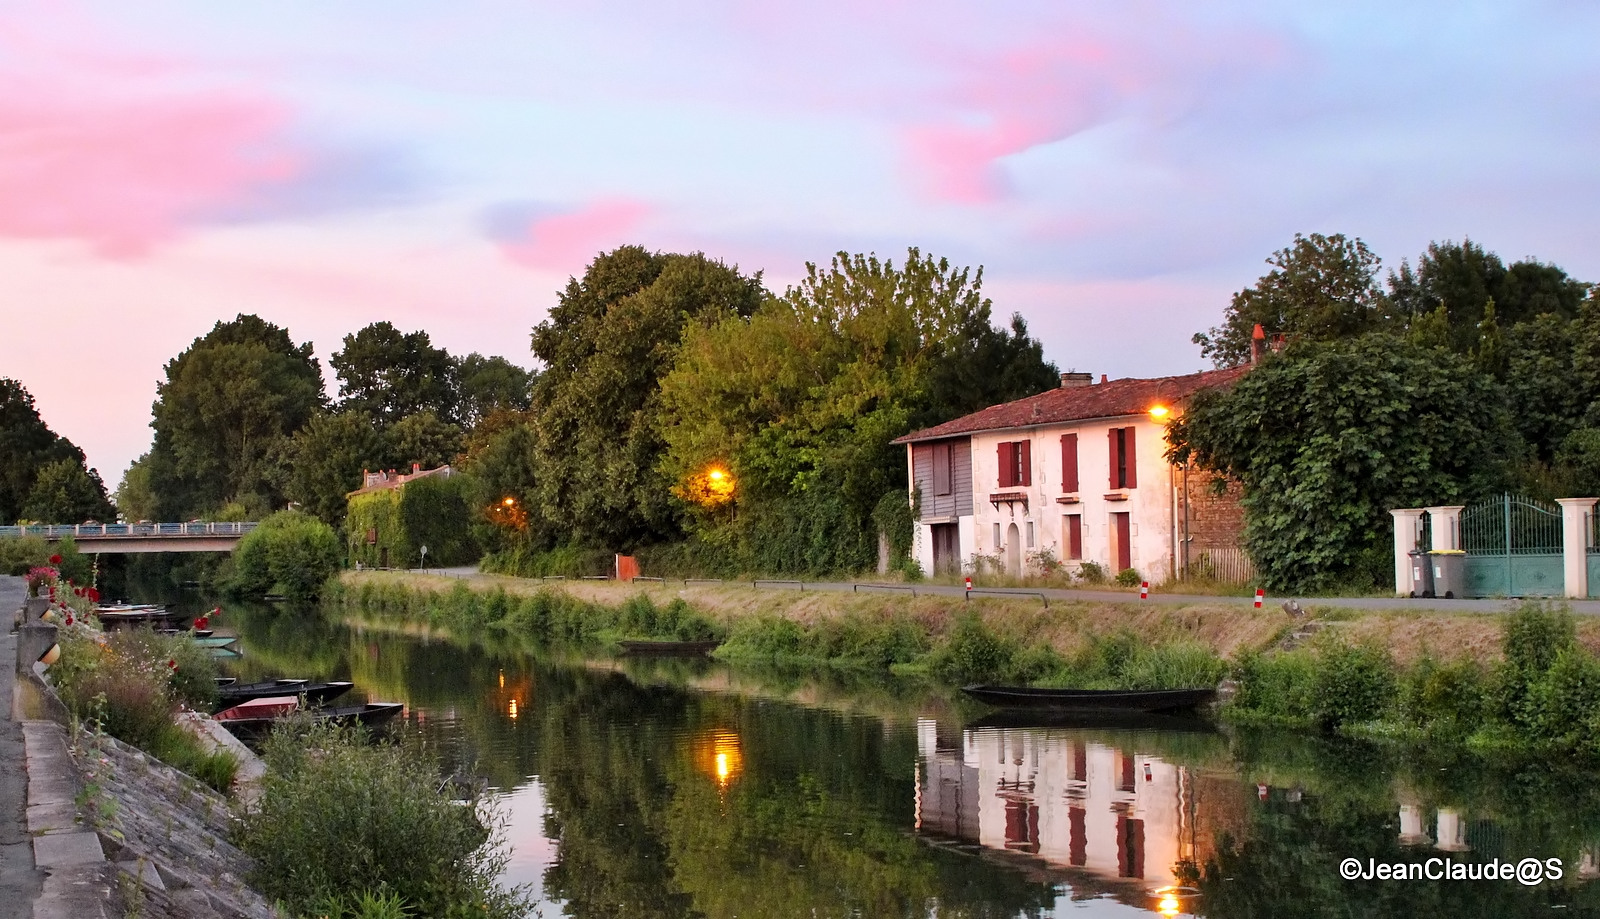 Le Marais Poitevin Img_0618_filtered-529c4ed